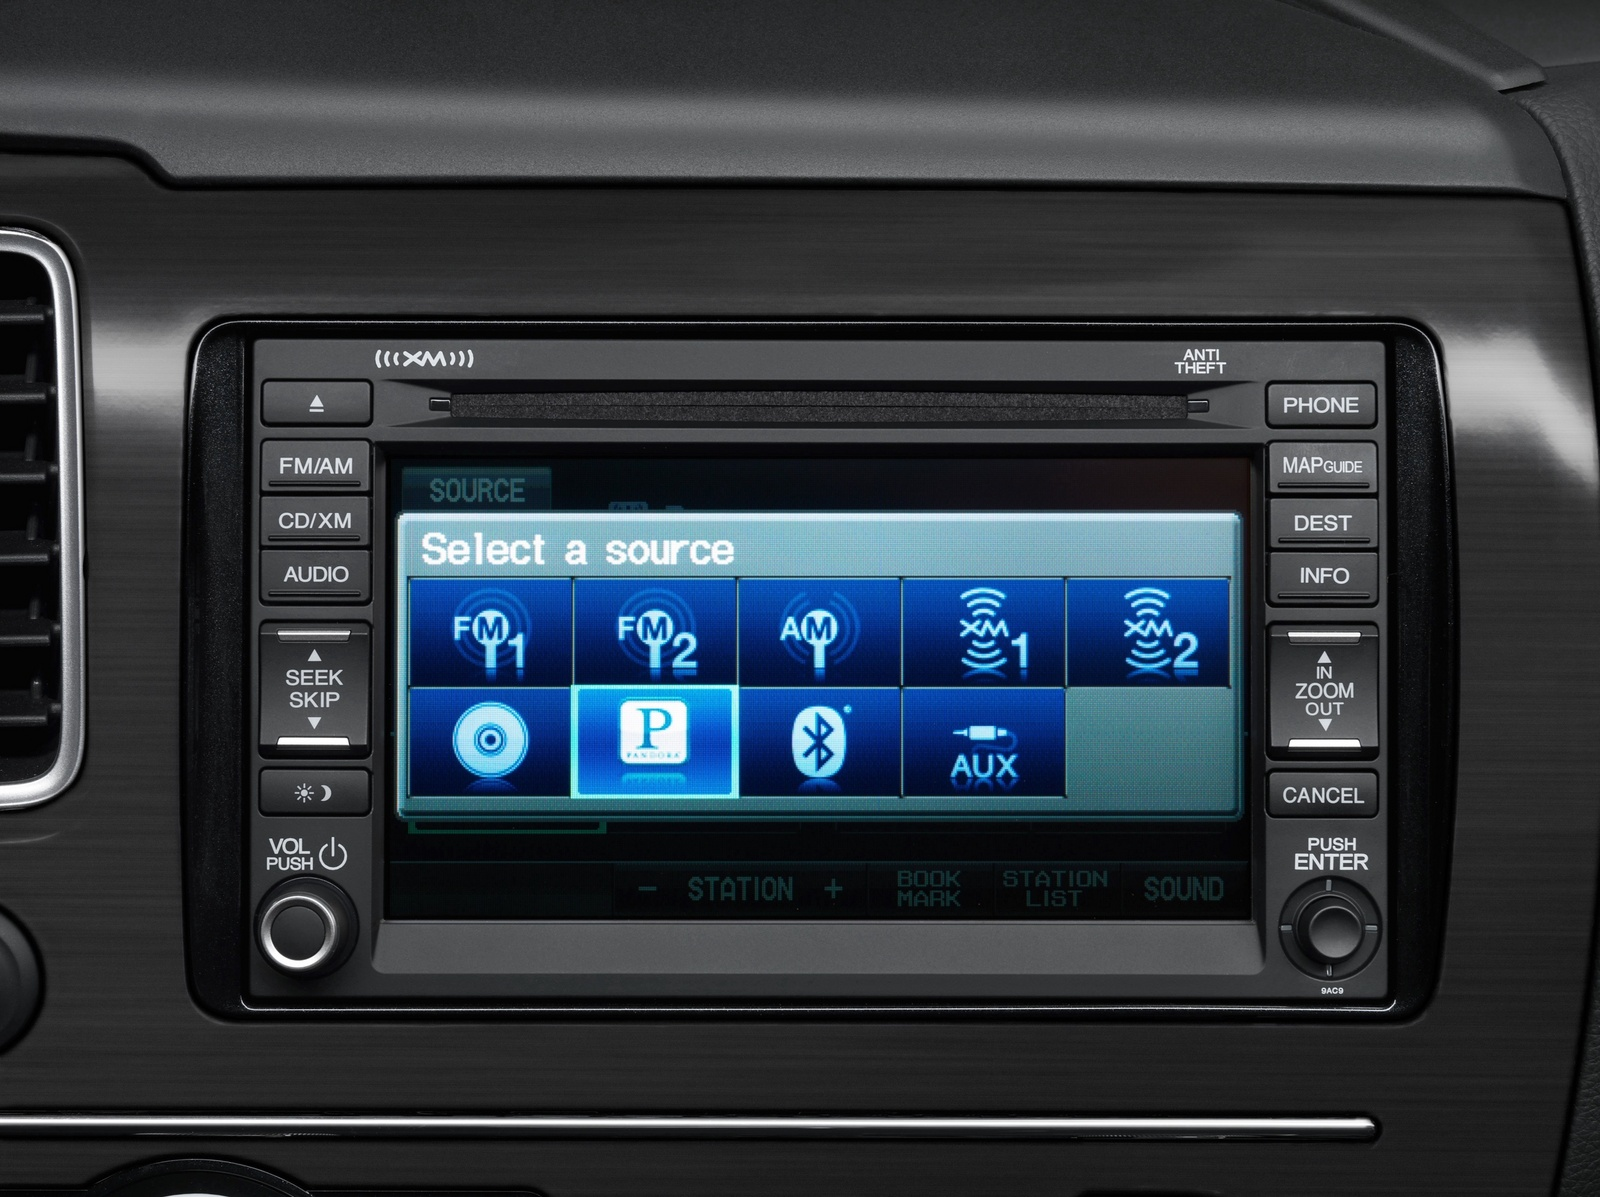 2013 Honda Civic, Civic stereo, interior, manufacturer